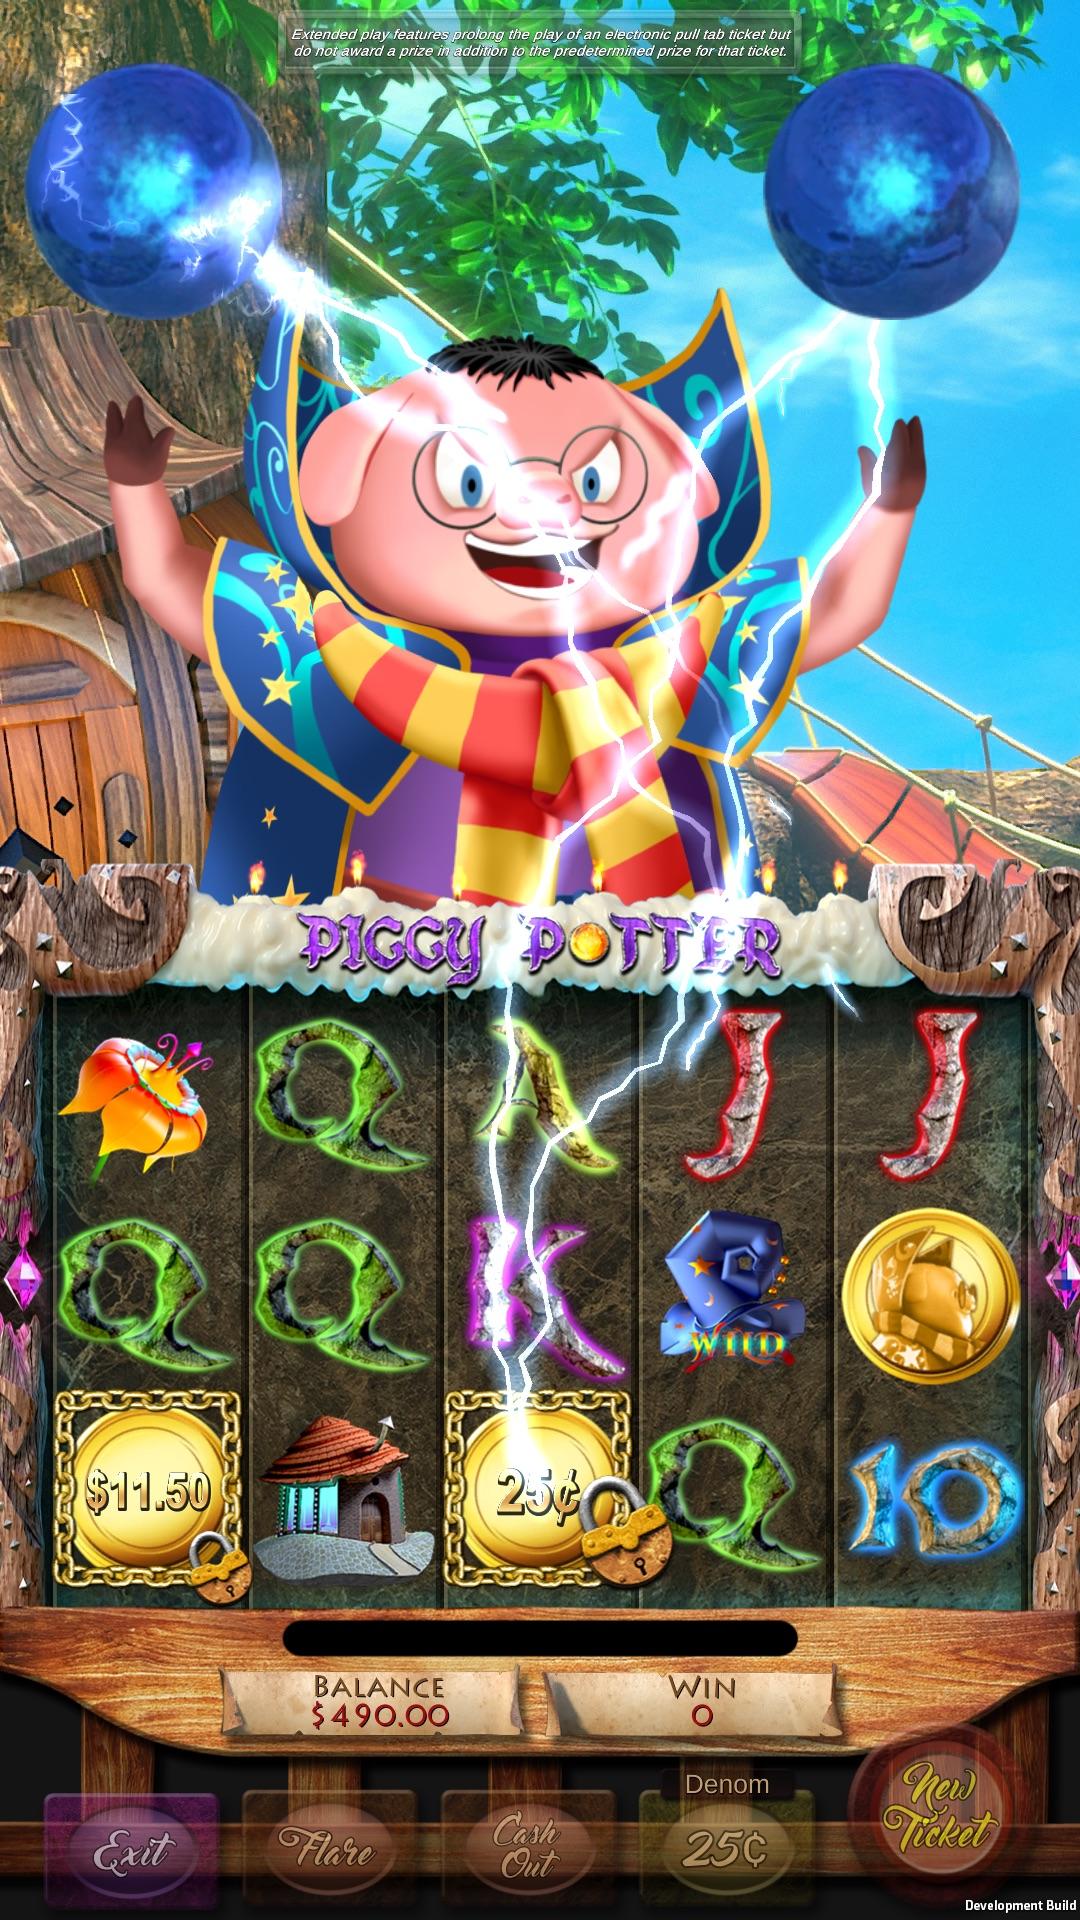 Piggy-Potter-Vertical-pull-tab-game-screen-shot